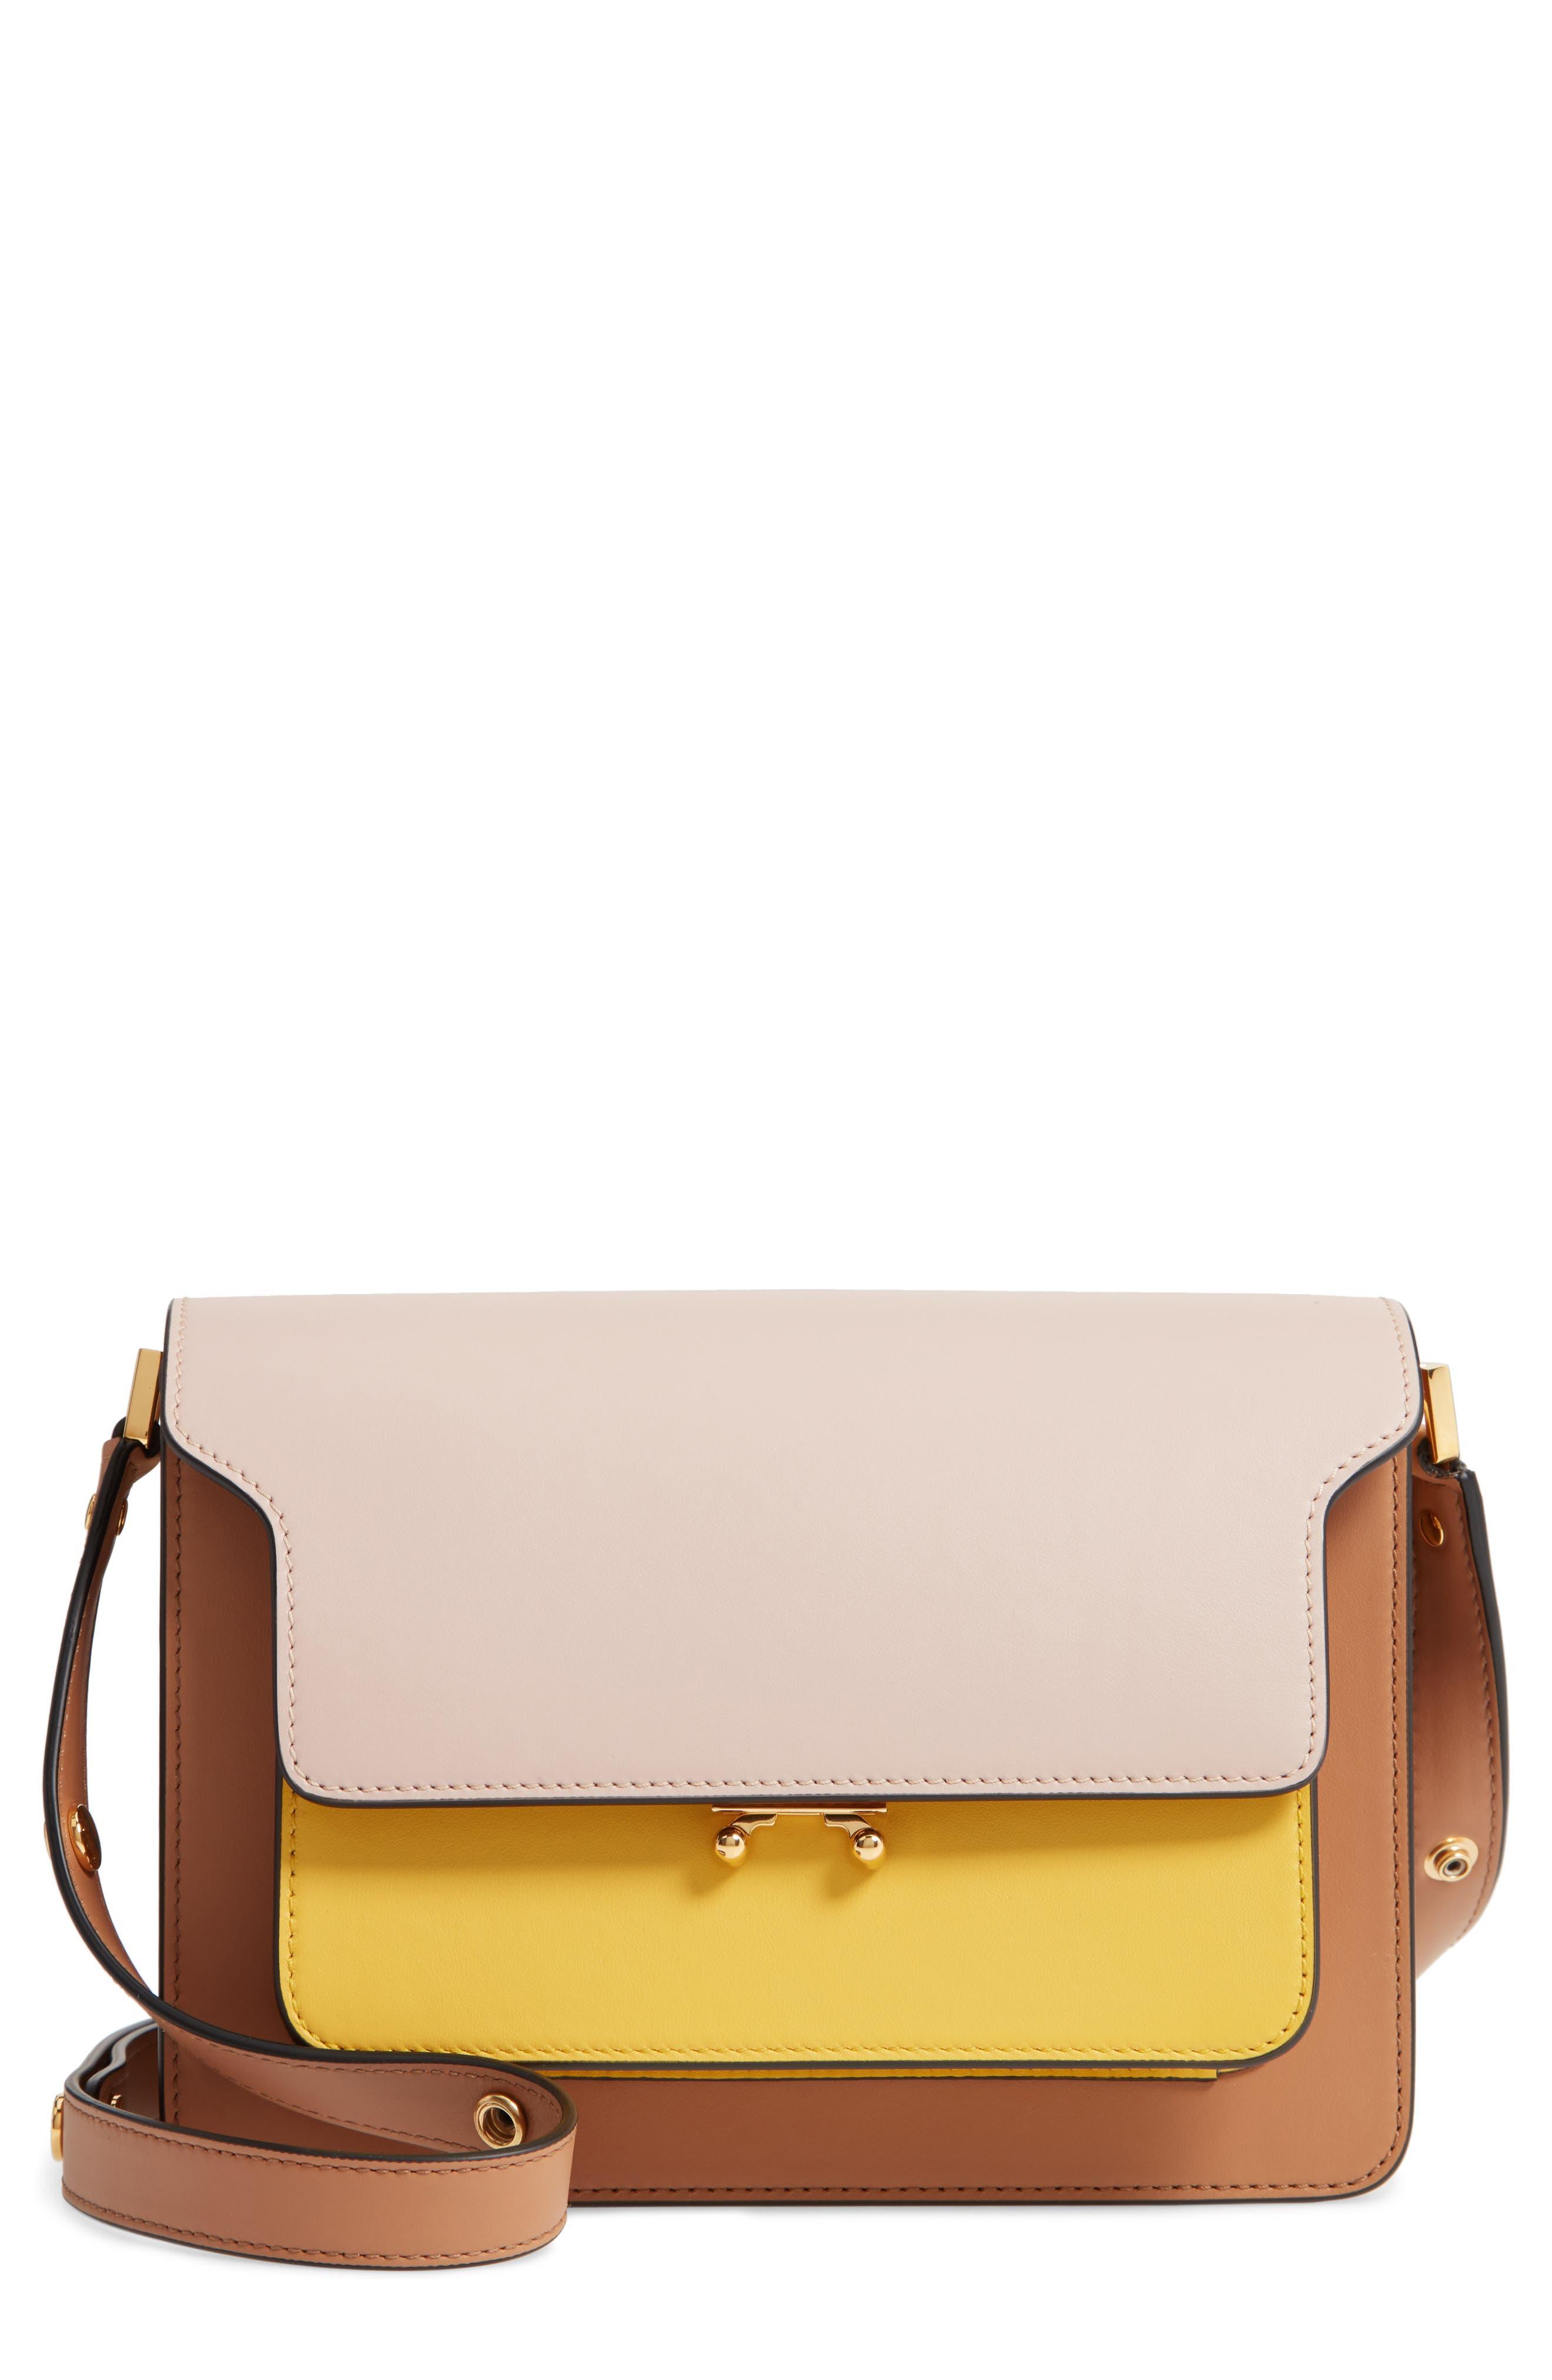 MARNI,                             Trunk Colorblock Leather Shoulder Bag,                             Main thumbnail 1, color,                             QUARTZ/ SUNO/ POMPEII